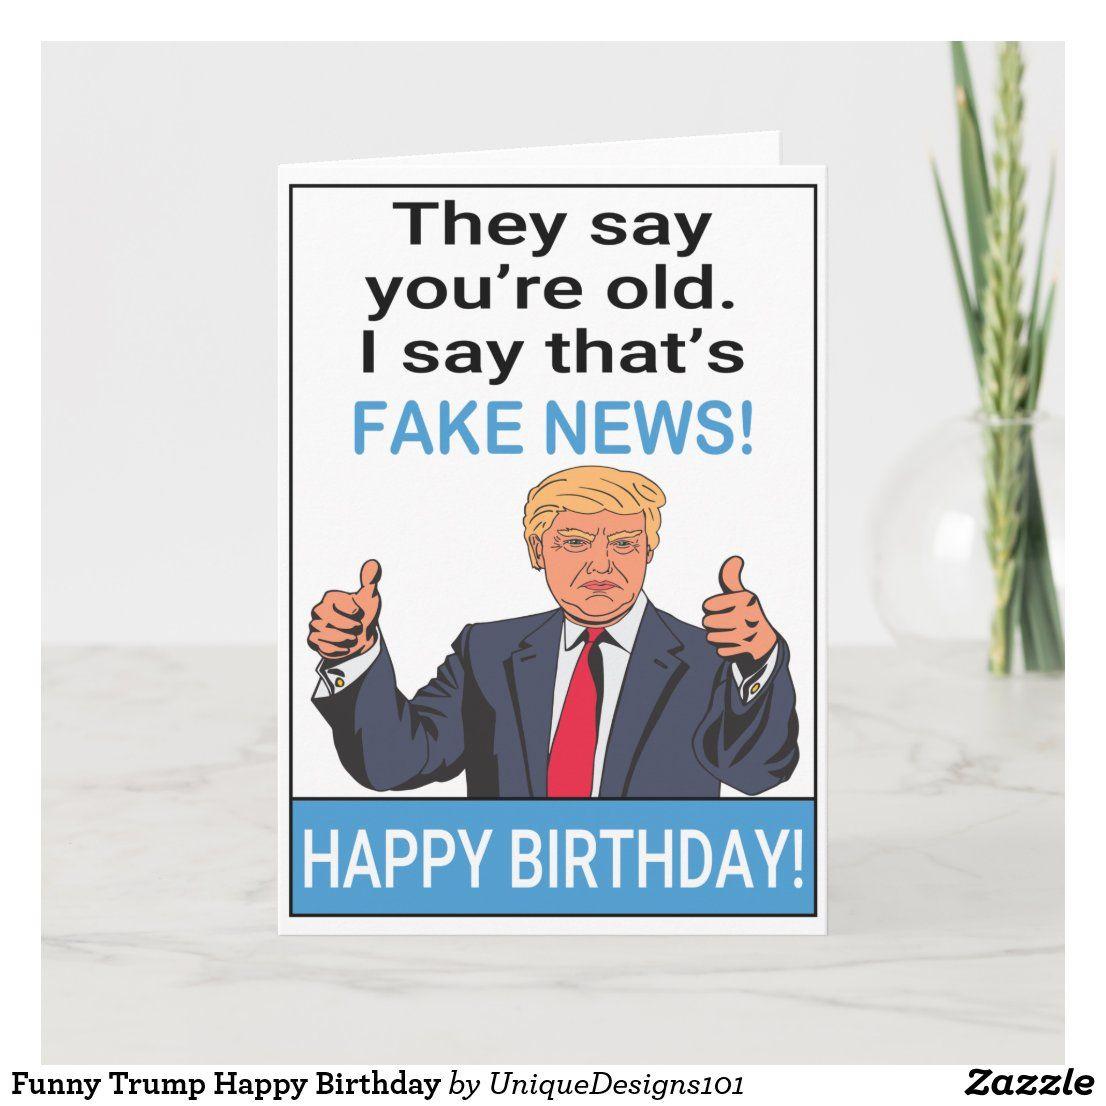 Funny Trump Happy Birthday Card Funny Happy Birthday Wishes Happy Birthday Funny Birthday Quotes Funny